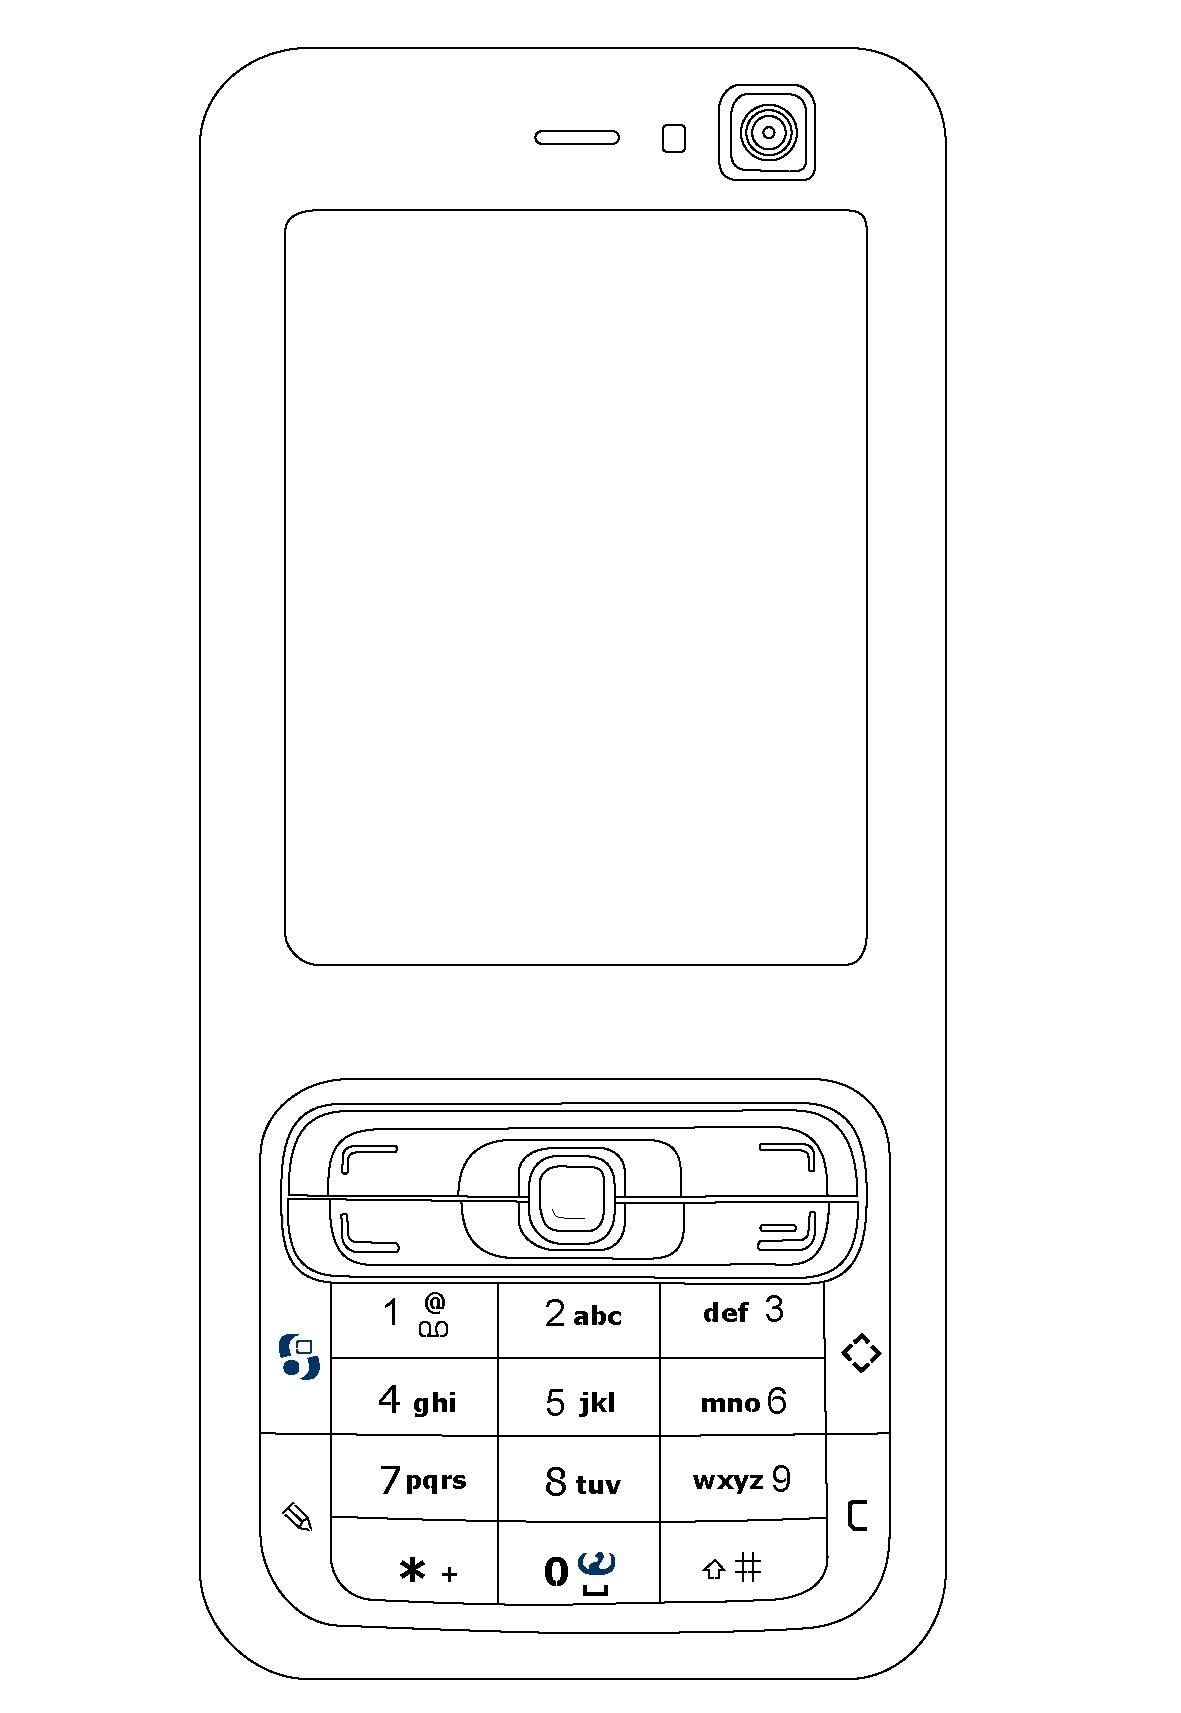 Teléfonos celulares para colorear | Colorear imágenes